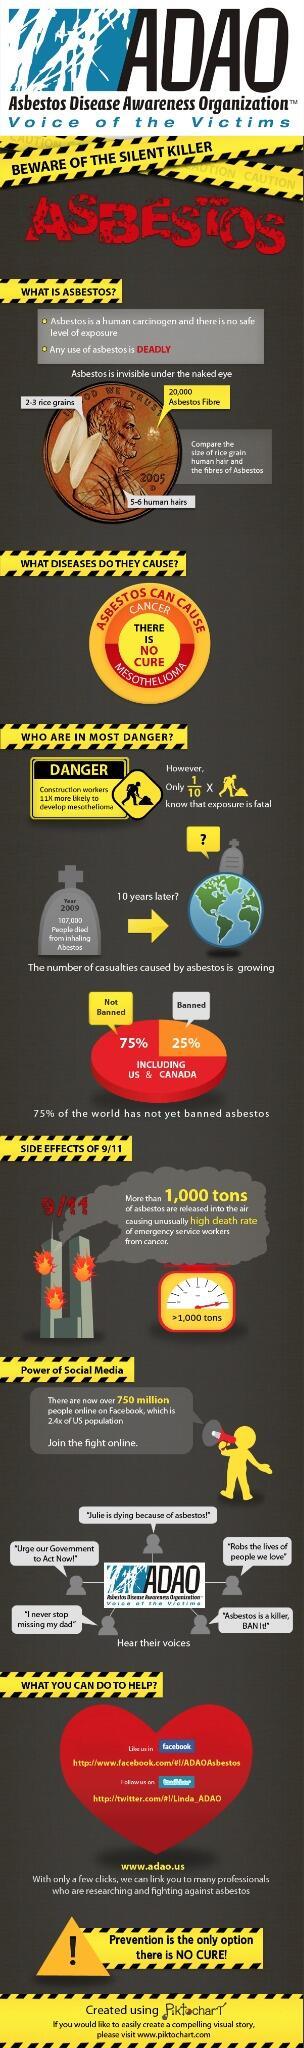 From Linda at ADAO via twitter asbestos